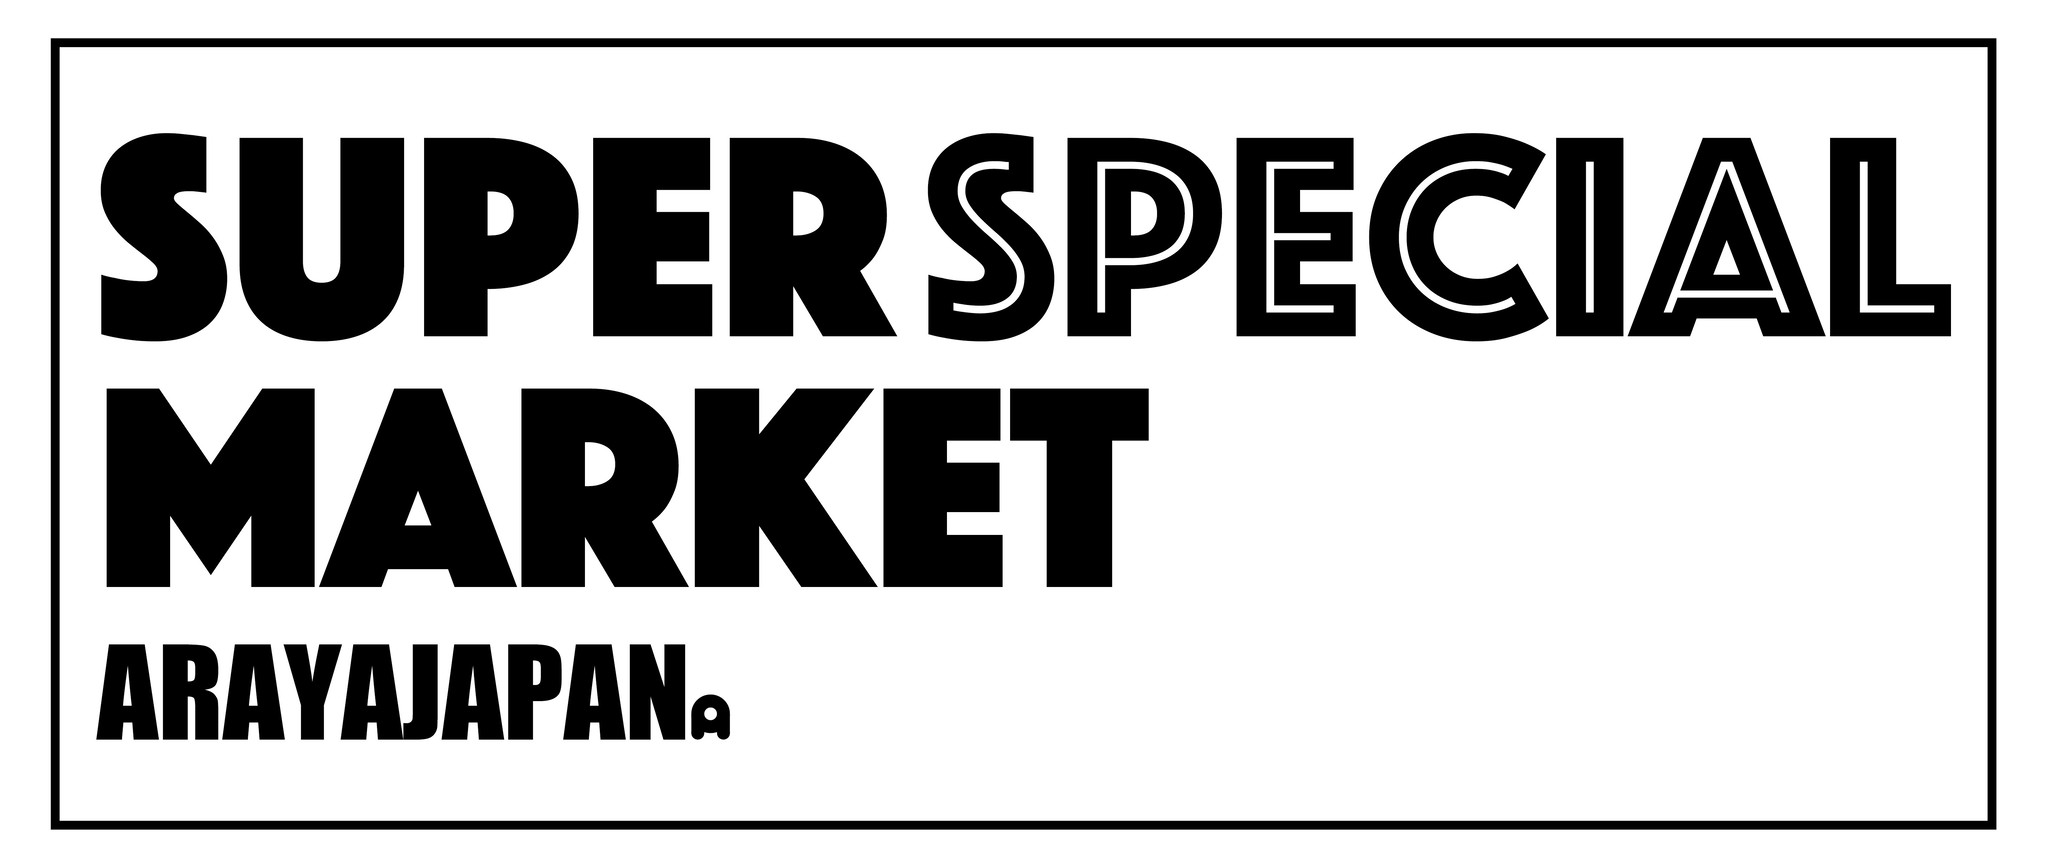 SUPER SPECIAL MARKET ARAYAJAPAN